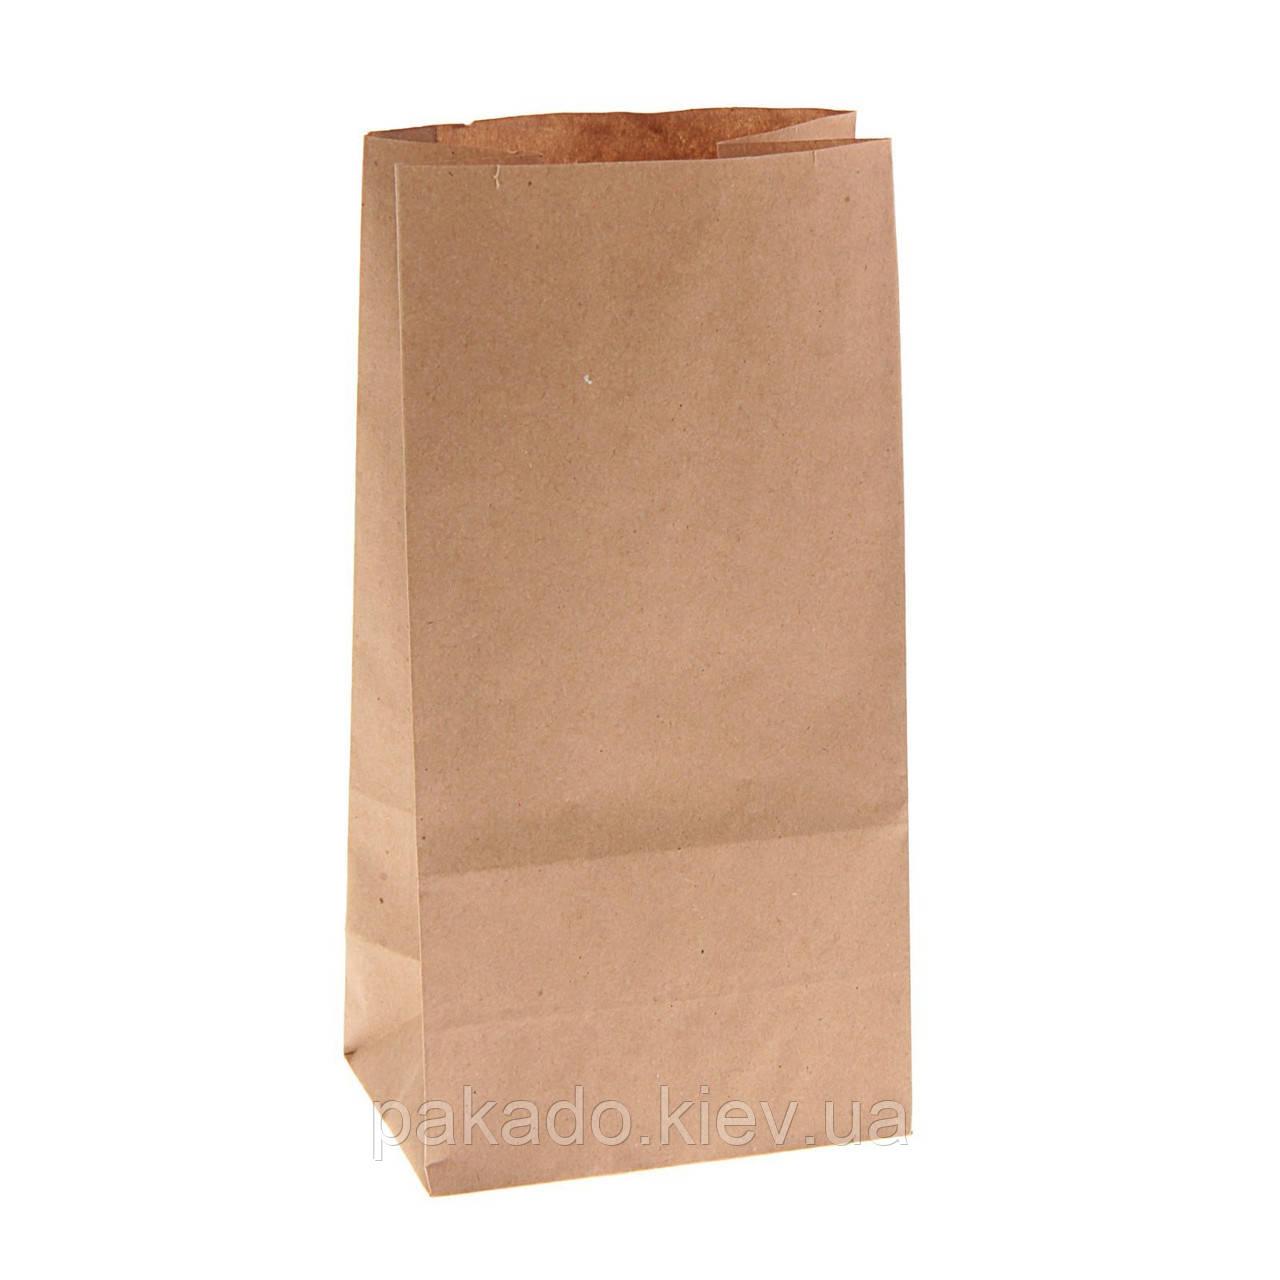 Паперовий пакет на винос 70х40х170 Бурий